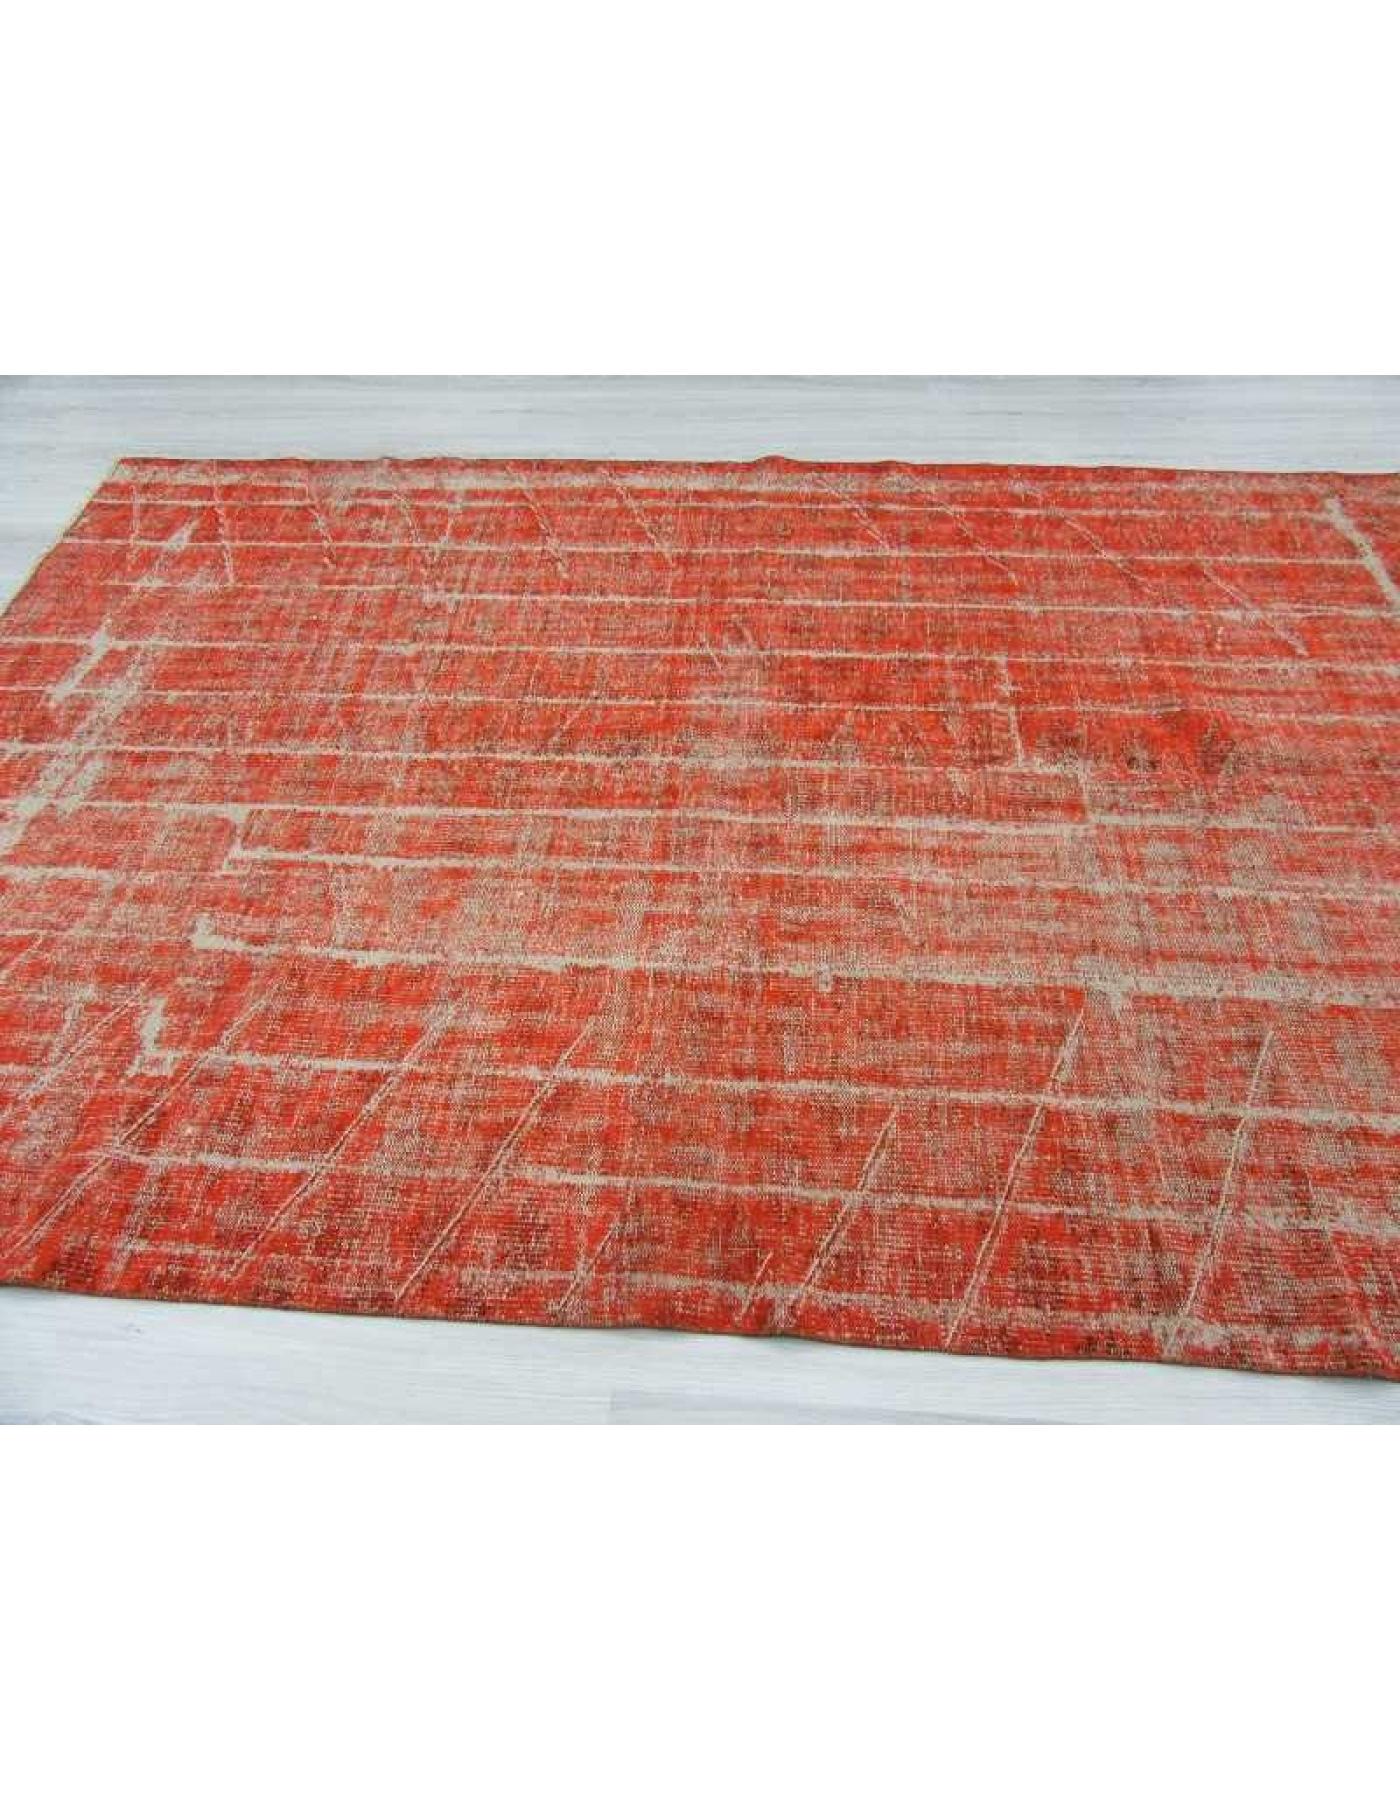 Vintage Orange Overdyed Turkish Rug